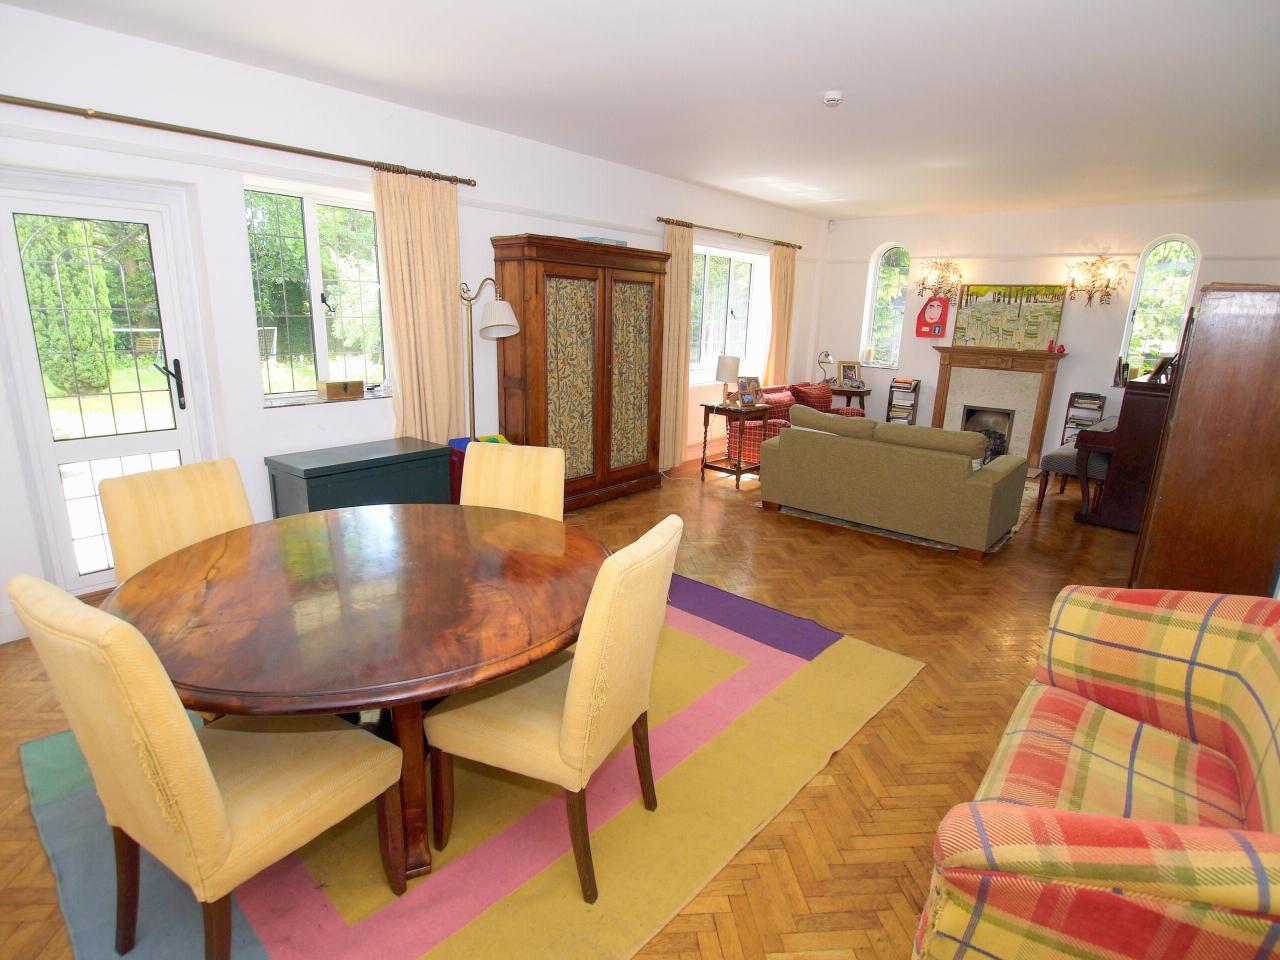 6 bedroom detached house Sold in Sevenoaks - Photograph 2